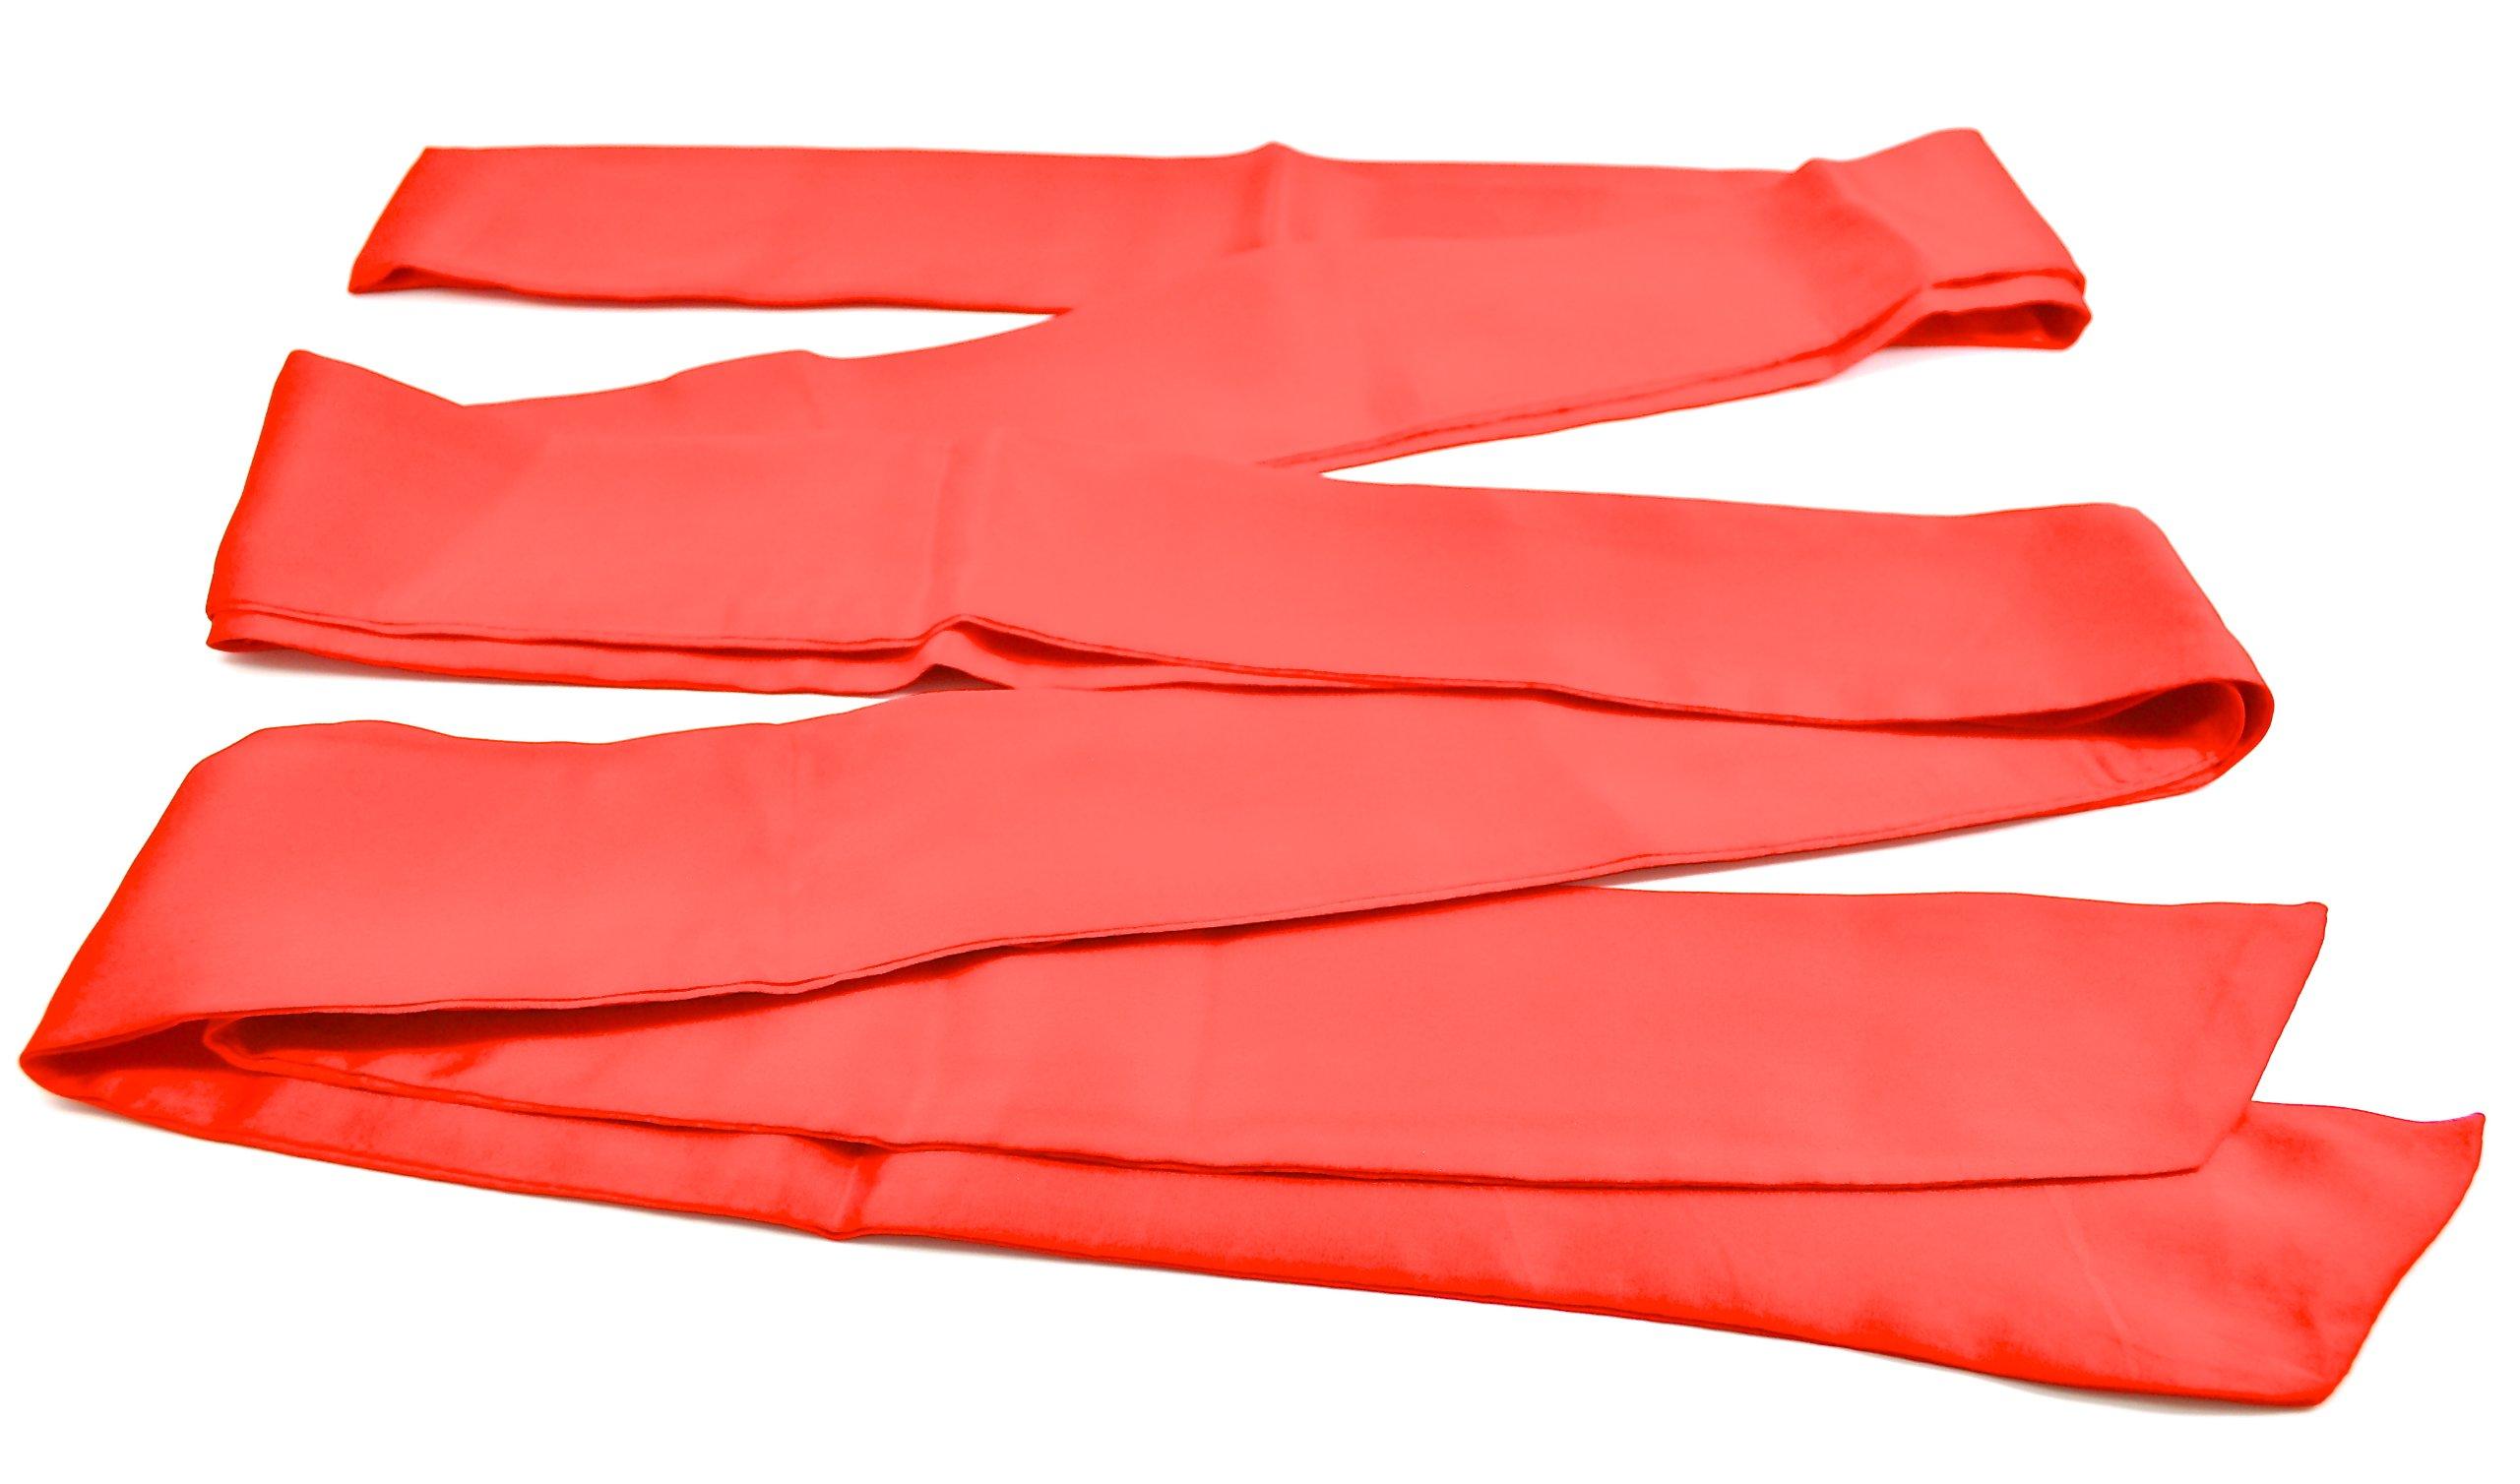 Silk Restraint Sash   Luxurious 100% Pure Silk Restraint   13' Sash (Red) by Sade Fantasy (Image #3)